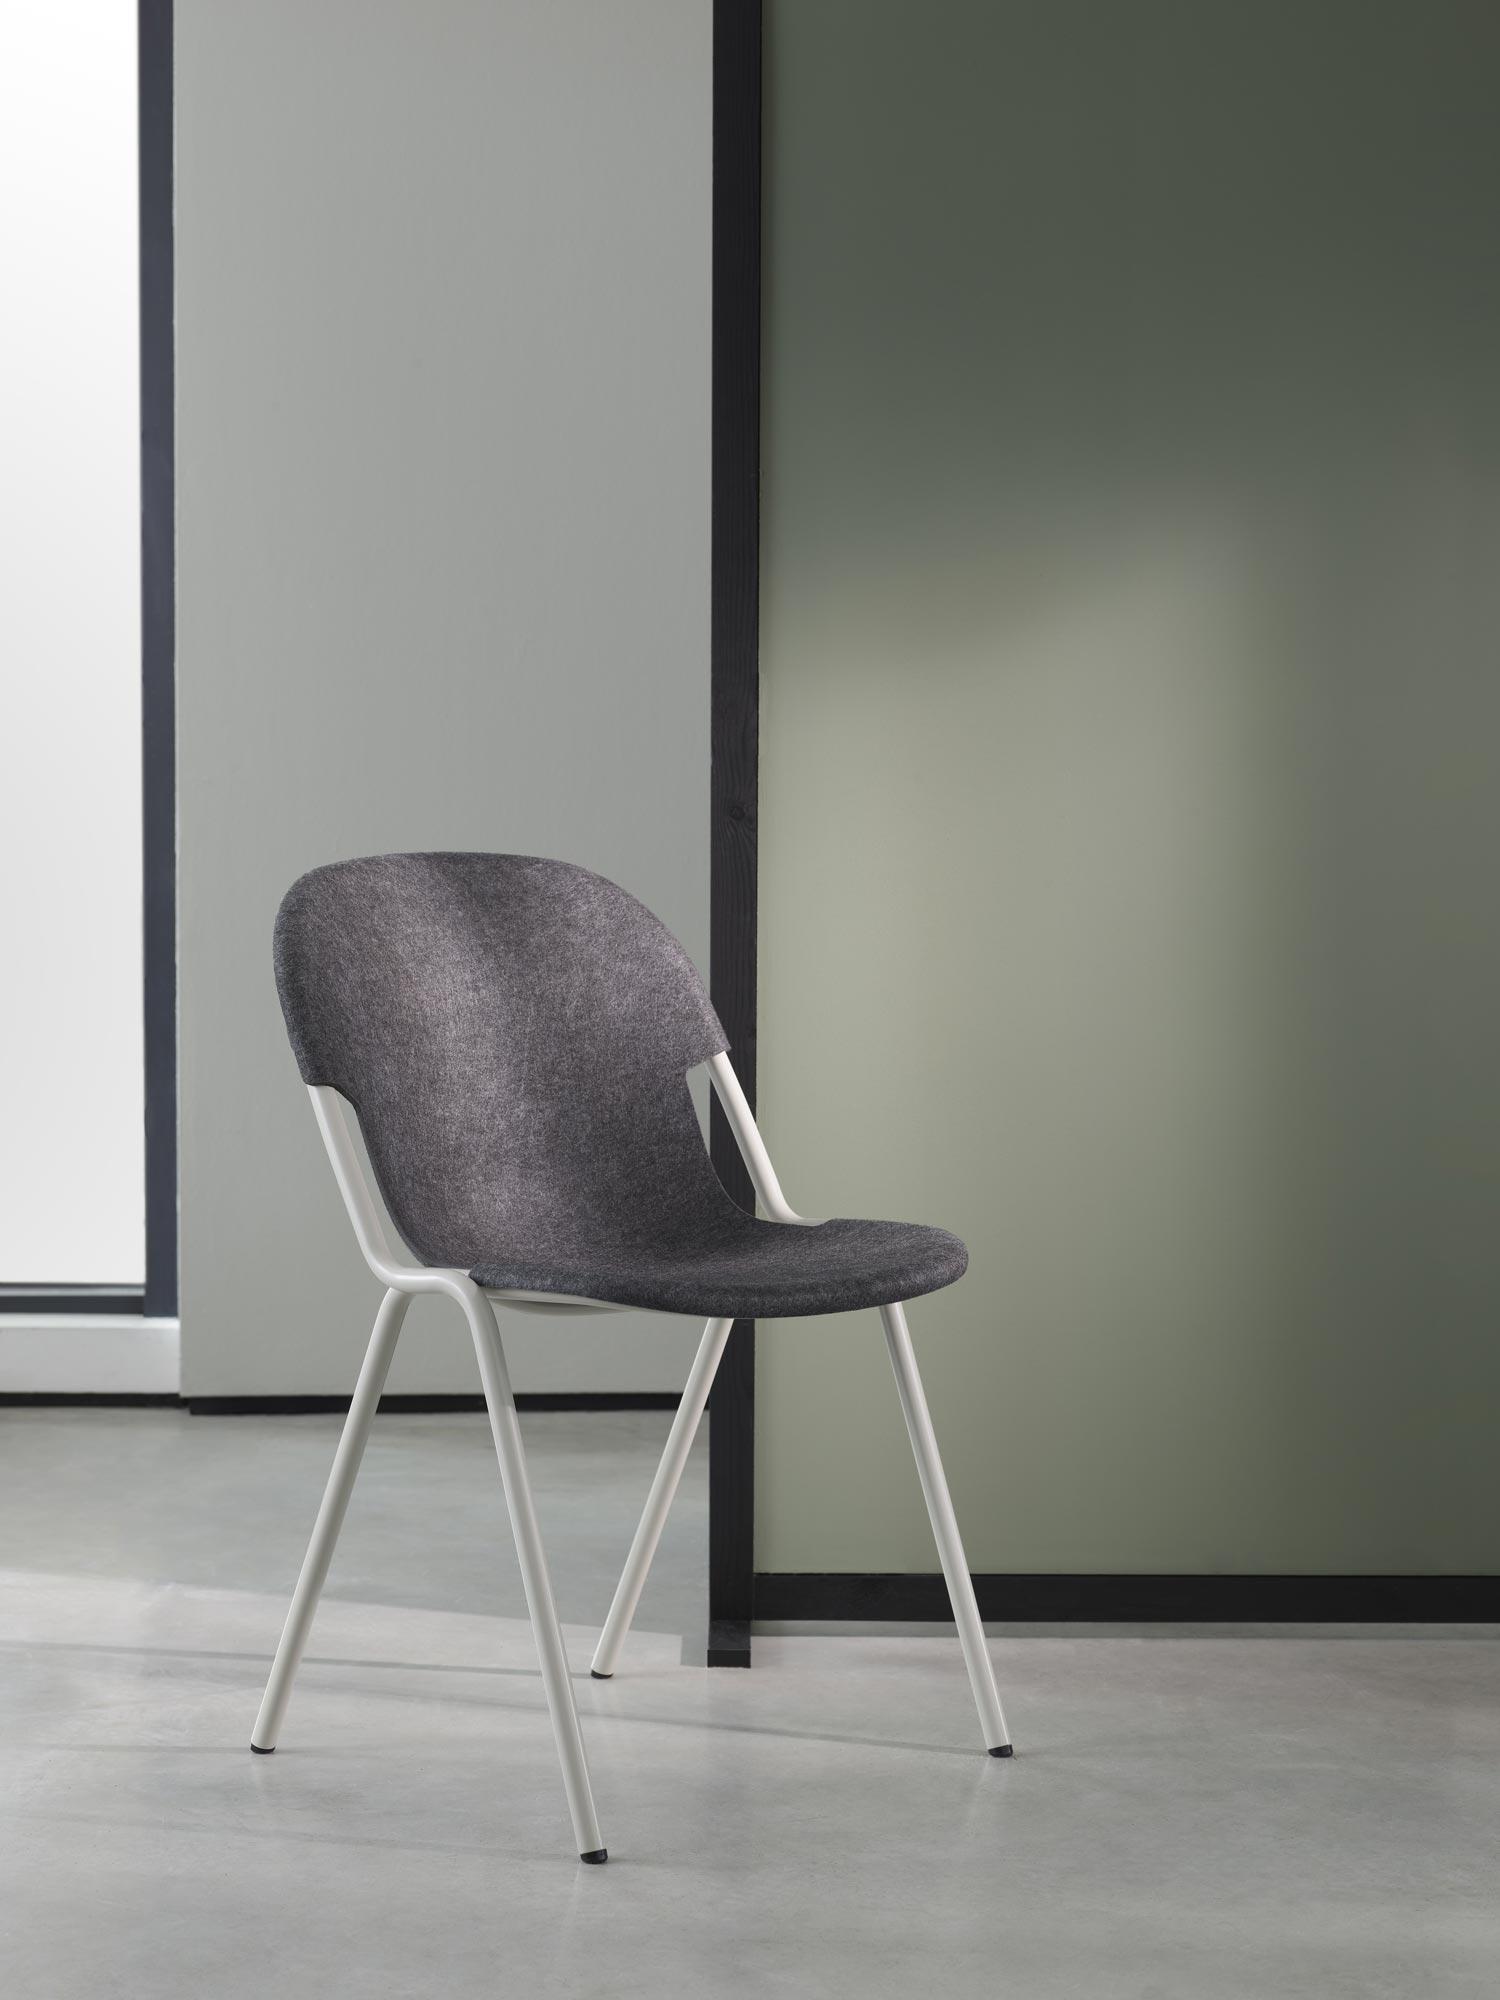 Stapelbarer Recycling-Stuhl von Michael Young für Modus